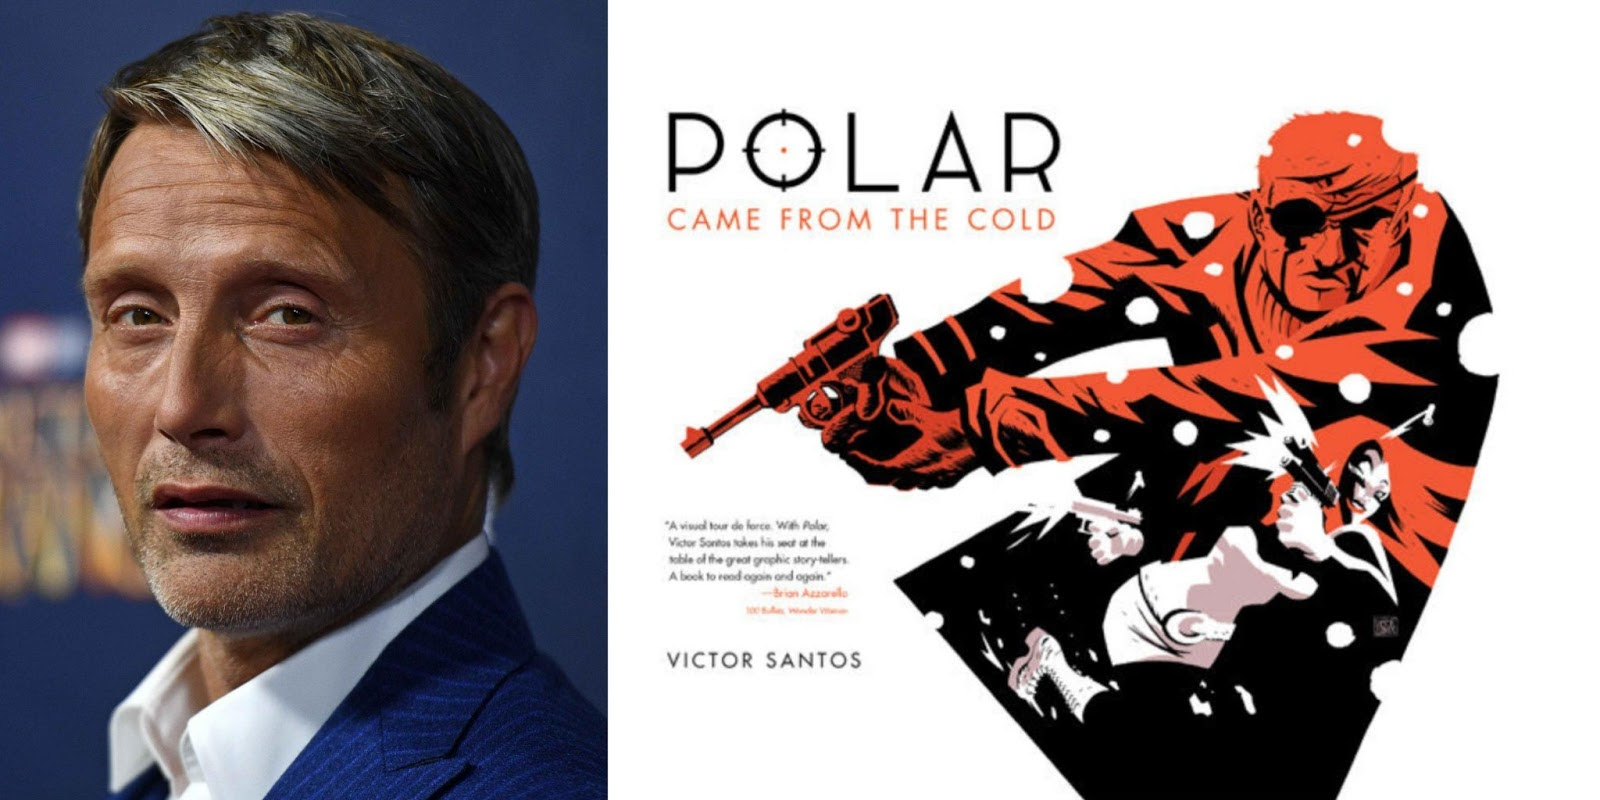 POLAR: Mads Mikkelsen To Star In The New Political Assassin Thriller Graphic Novel Adaptation